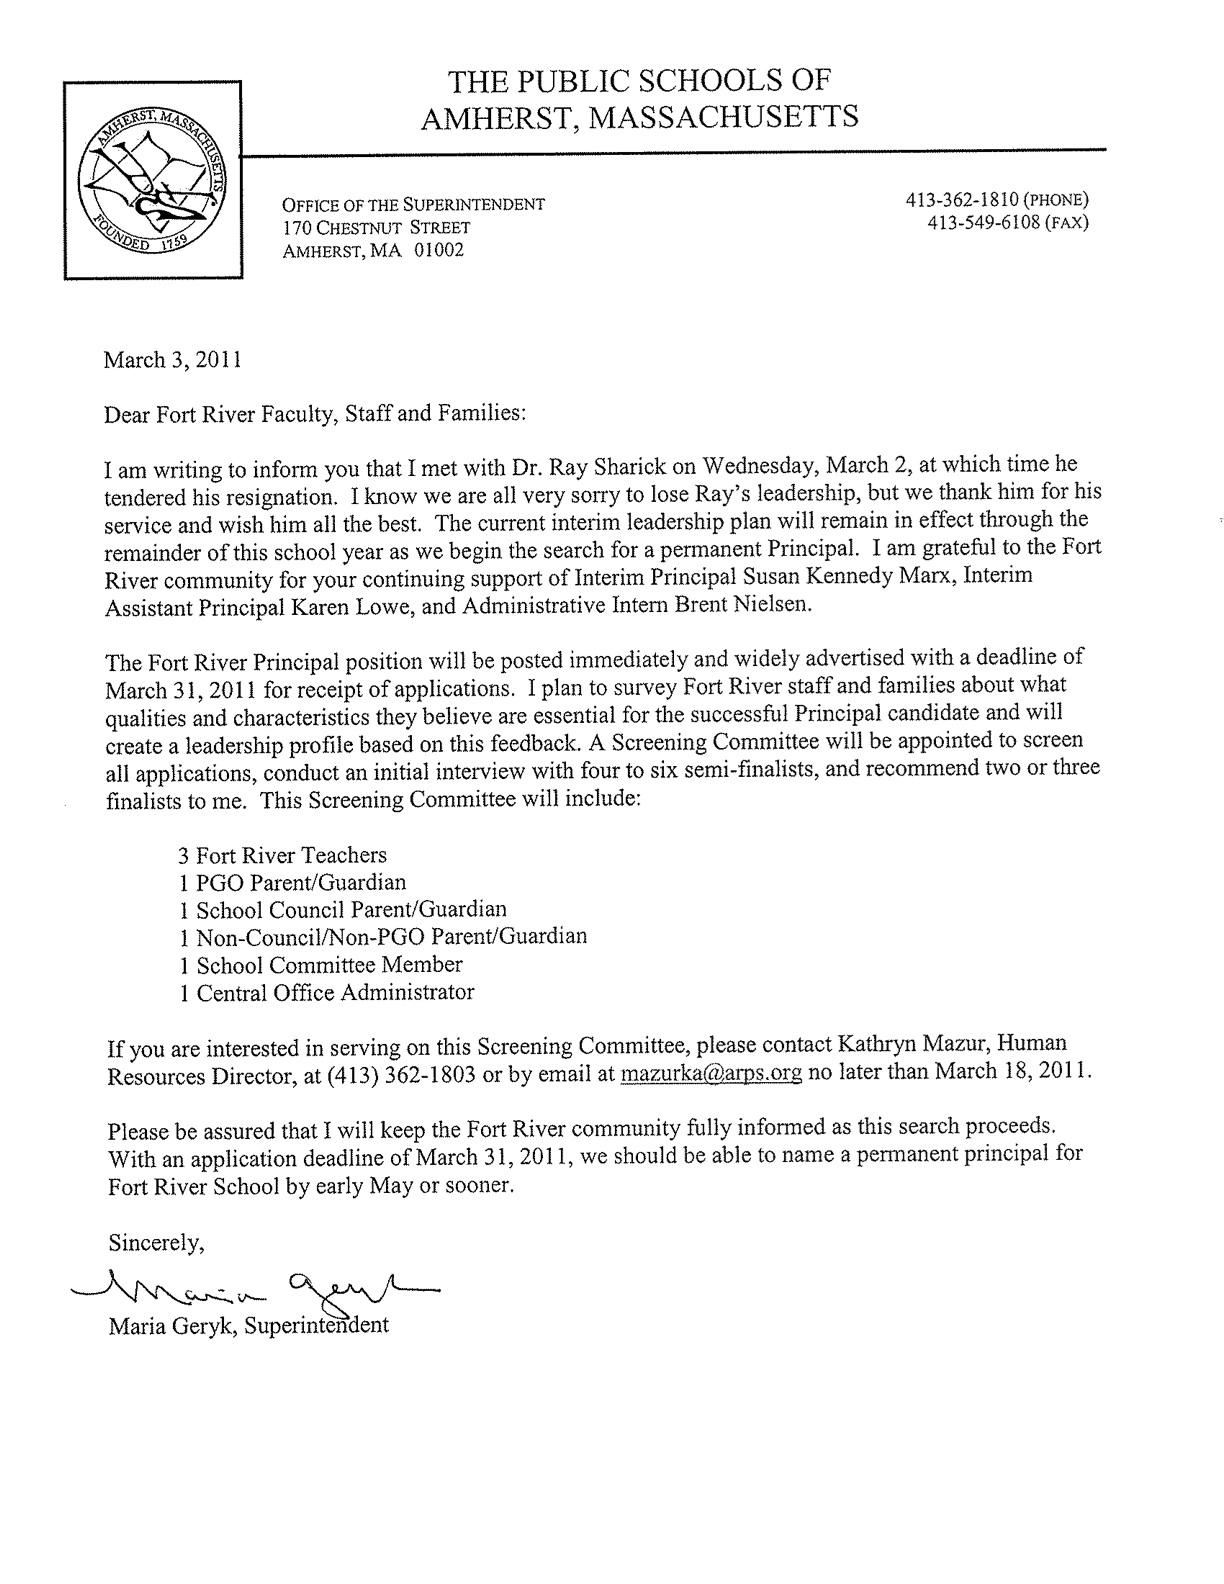 cover letter for online application sample